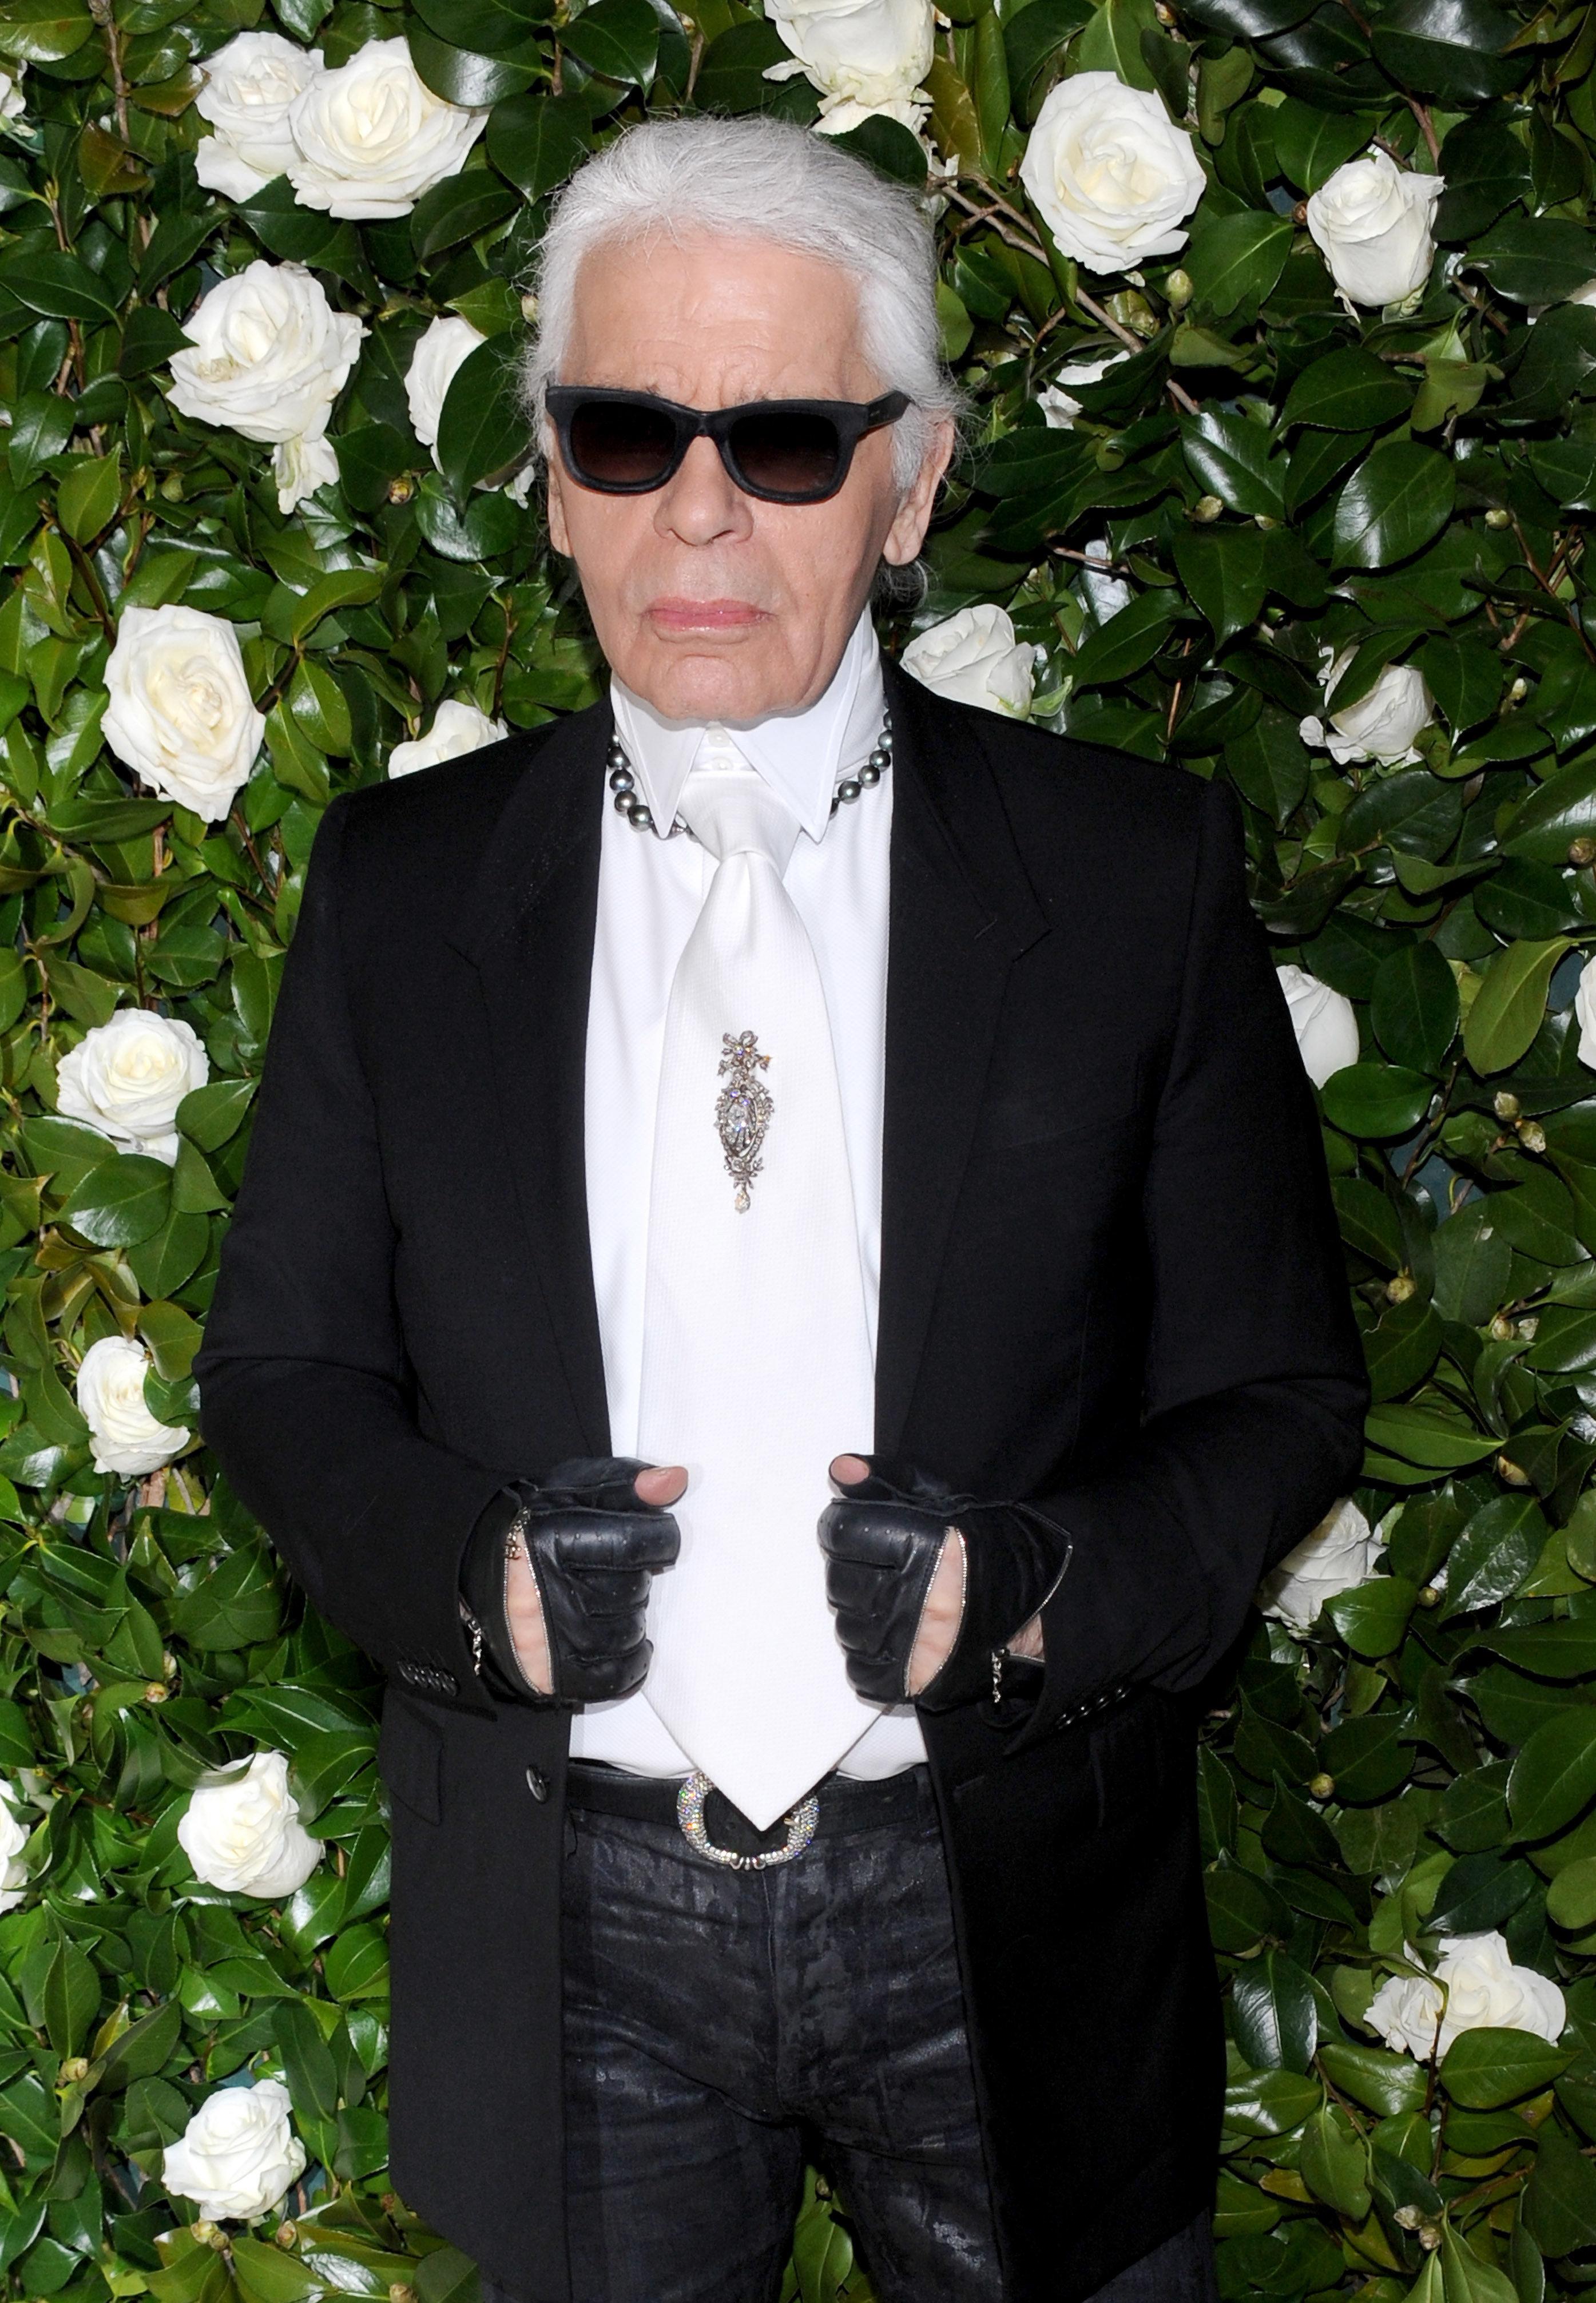 NEW YORK, NY - NOVEMBER 5: Karl Lagerfeld attends the Museum of Modern Art Film Benefit : A Tribute to Tilda Swinton on November 5, 2013 in New York City. Credit: Jon Palmer / MediaPunch /IPX